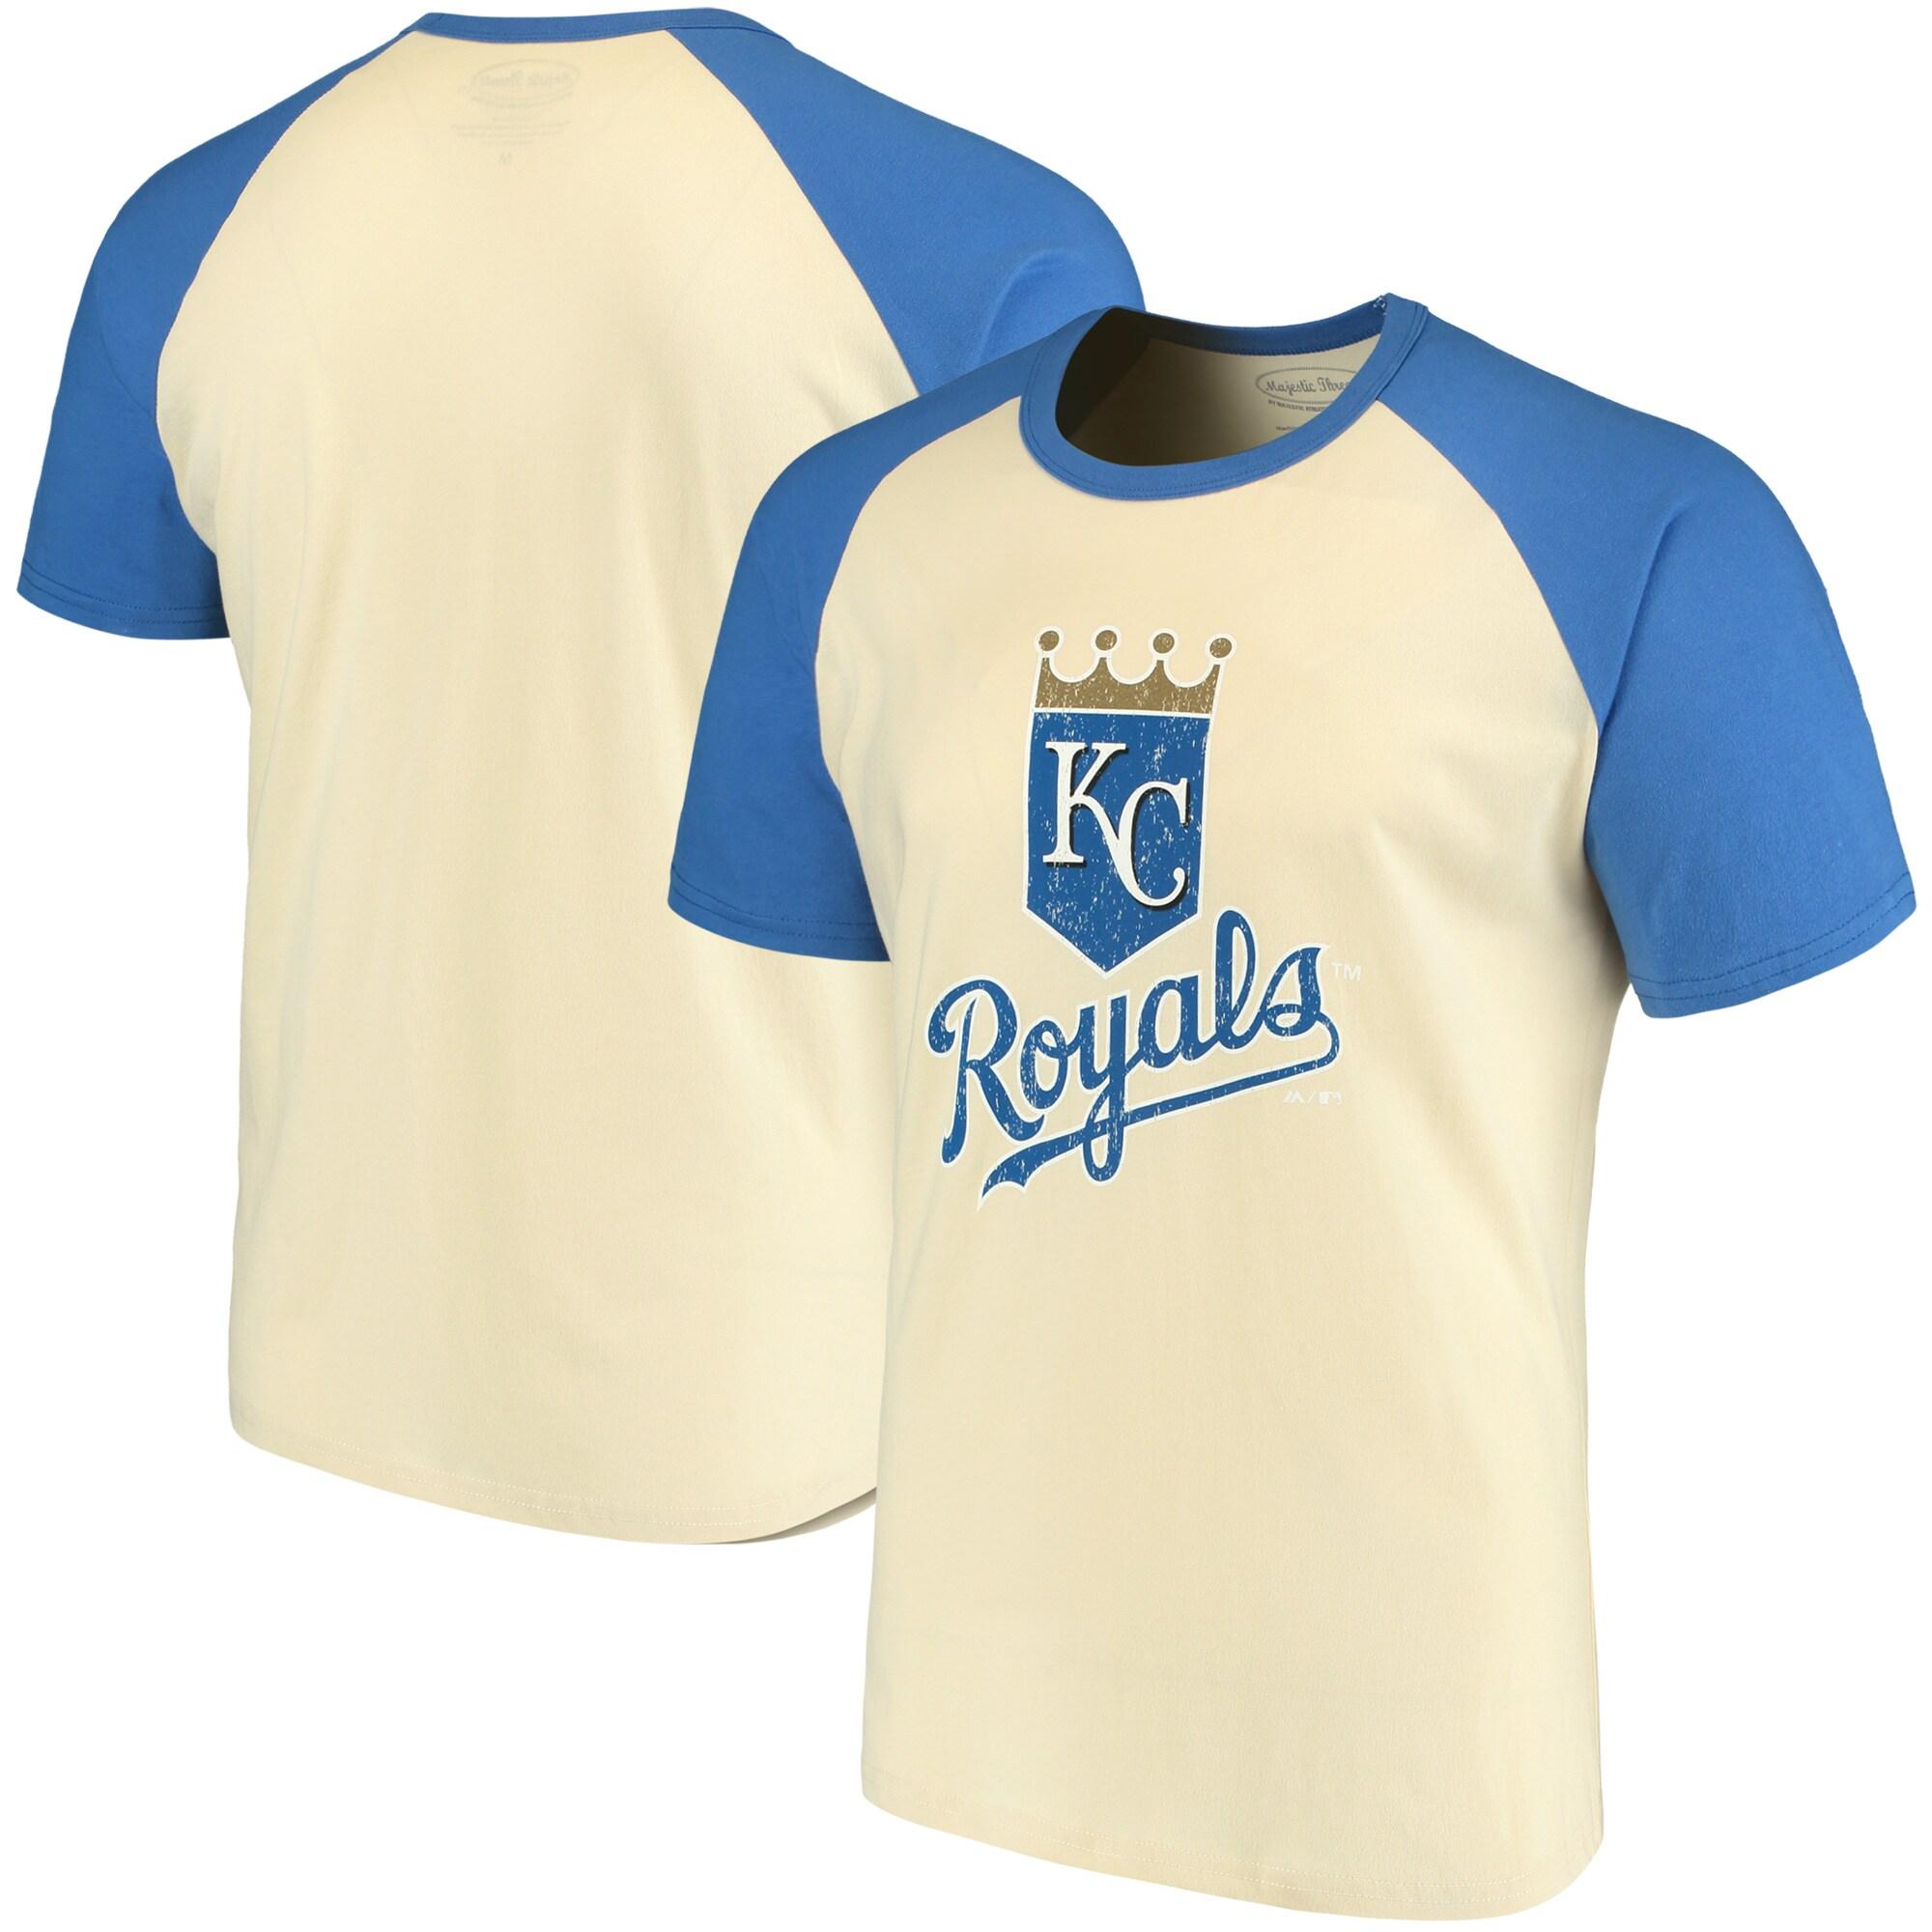 Kansas City Royals Majestic Threads Softhand Raglan T-Shirt - Cream/Royal